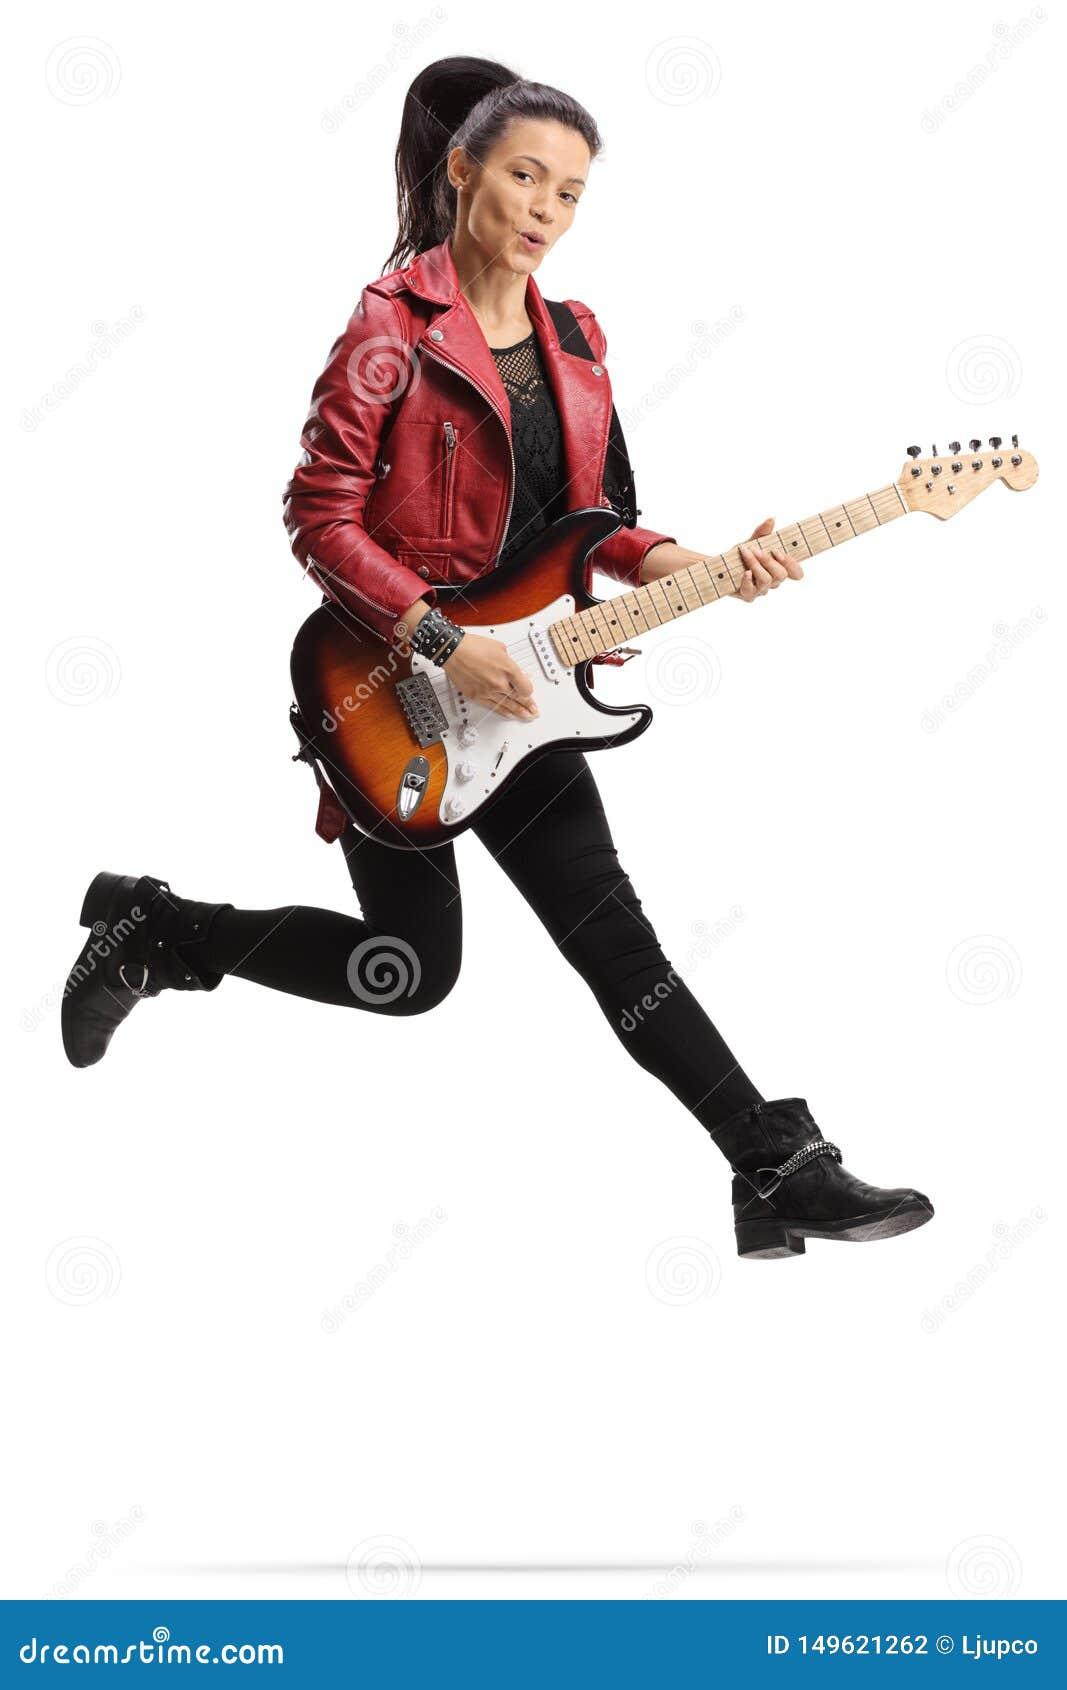 Jeune guitariste féminin jouant une guitare basse et sauter